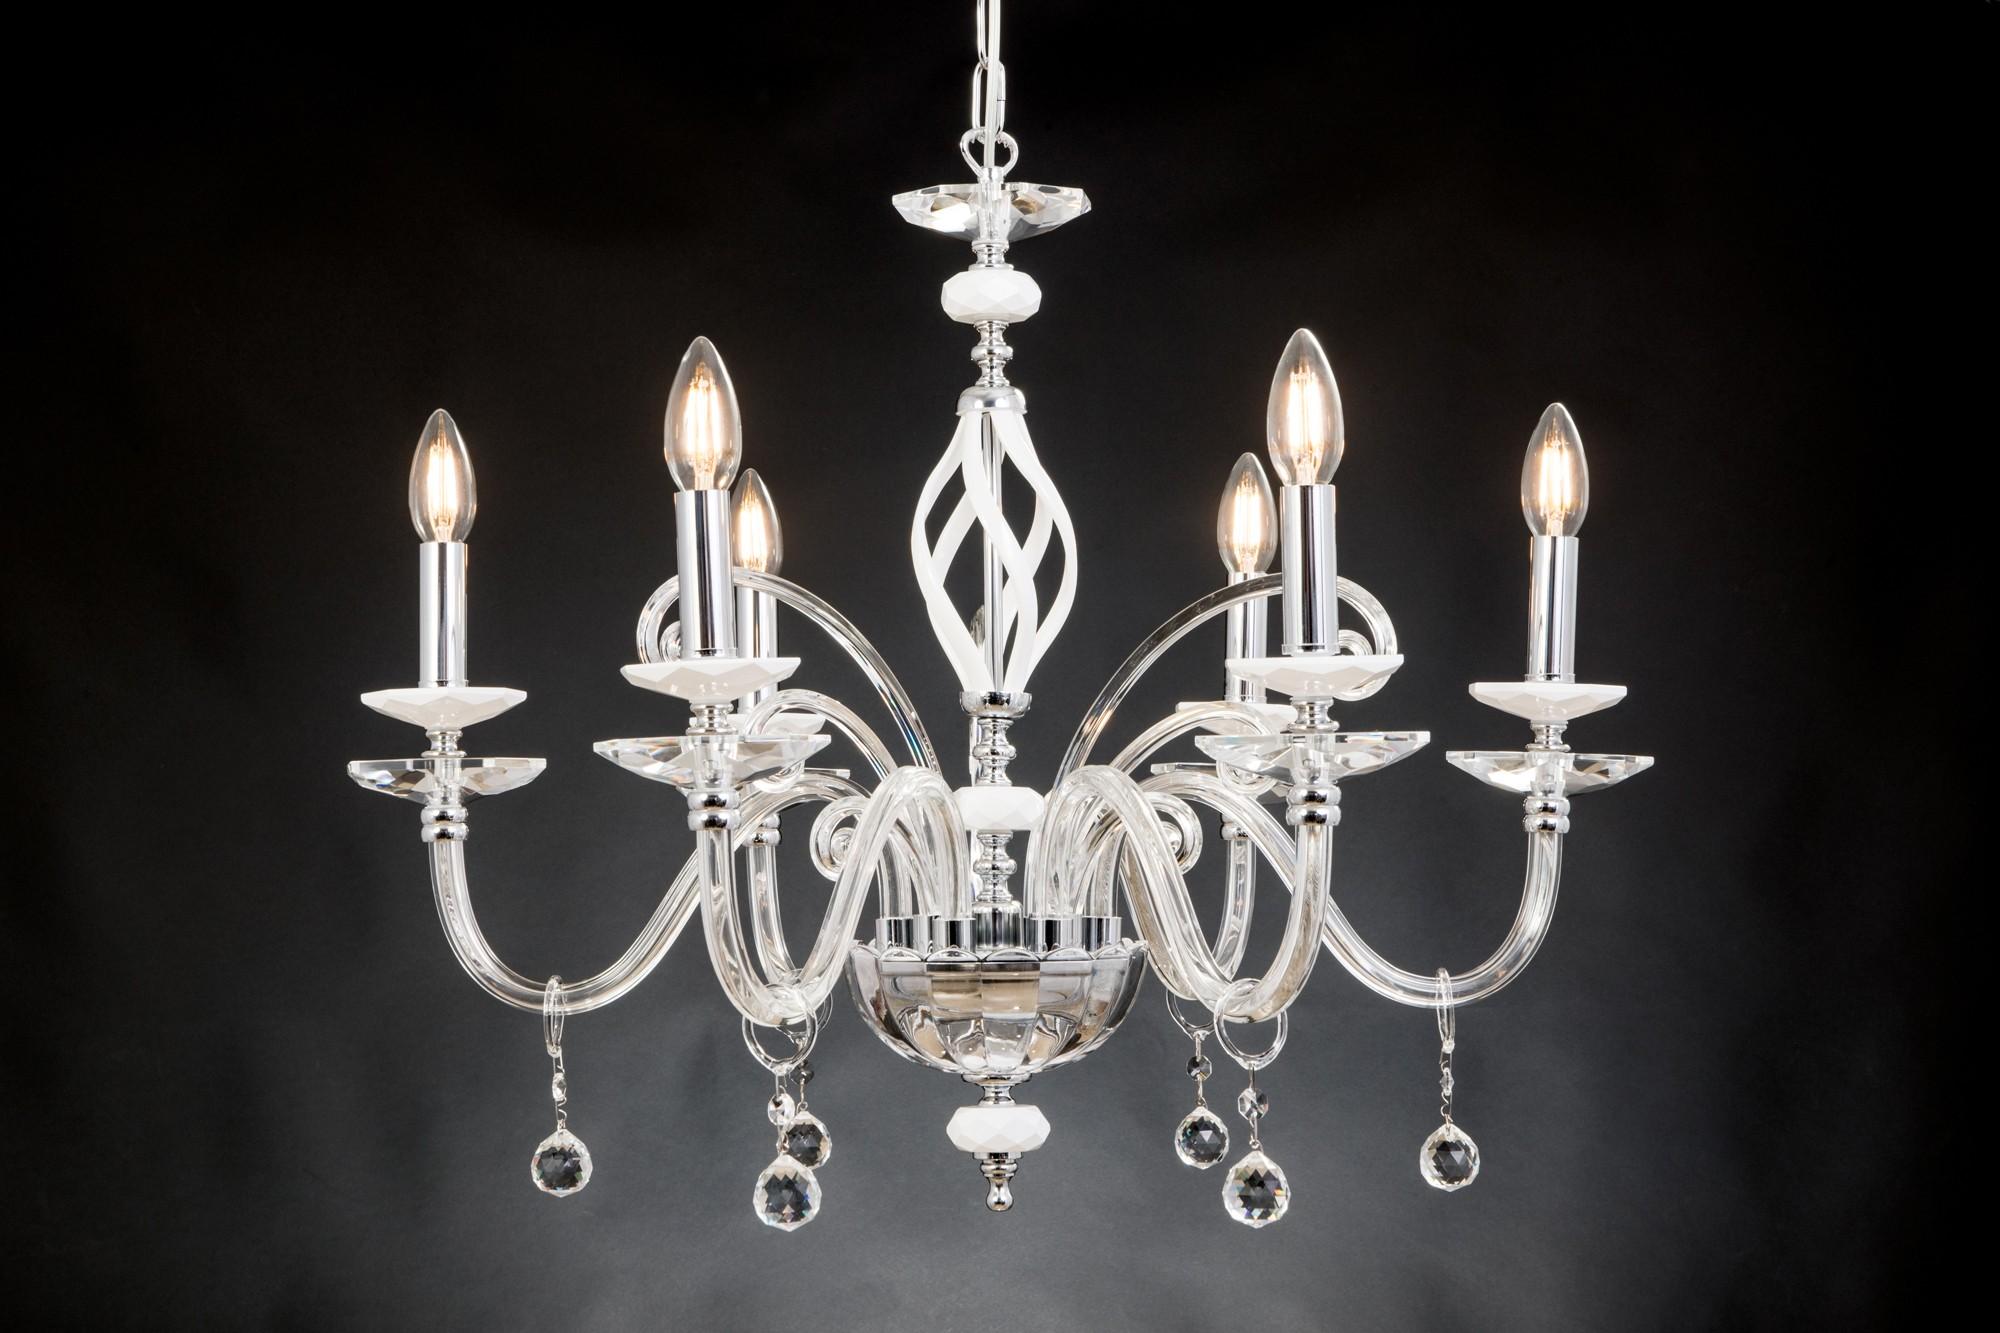 Lampadario Bianco E Cristallo : Lampadario bianco cristallo lampadari in cristallo manooi dal